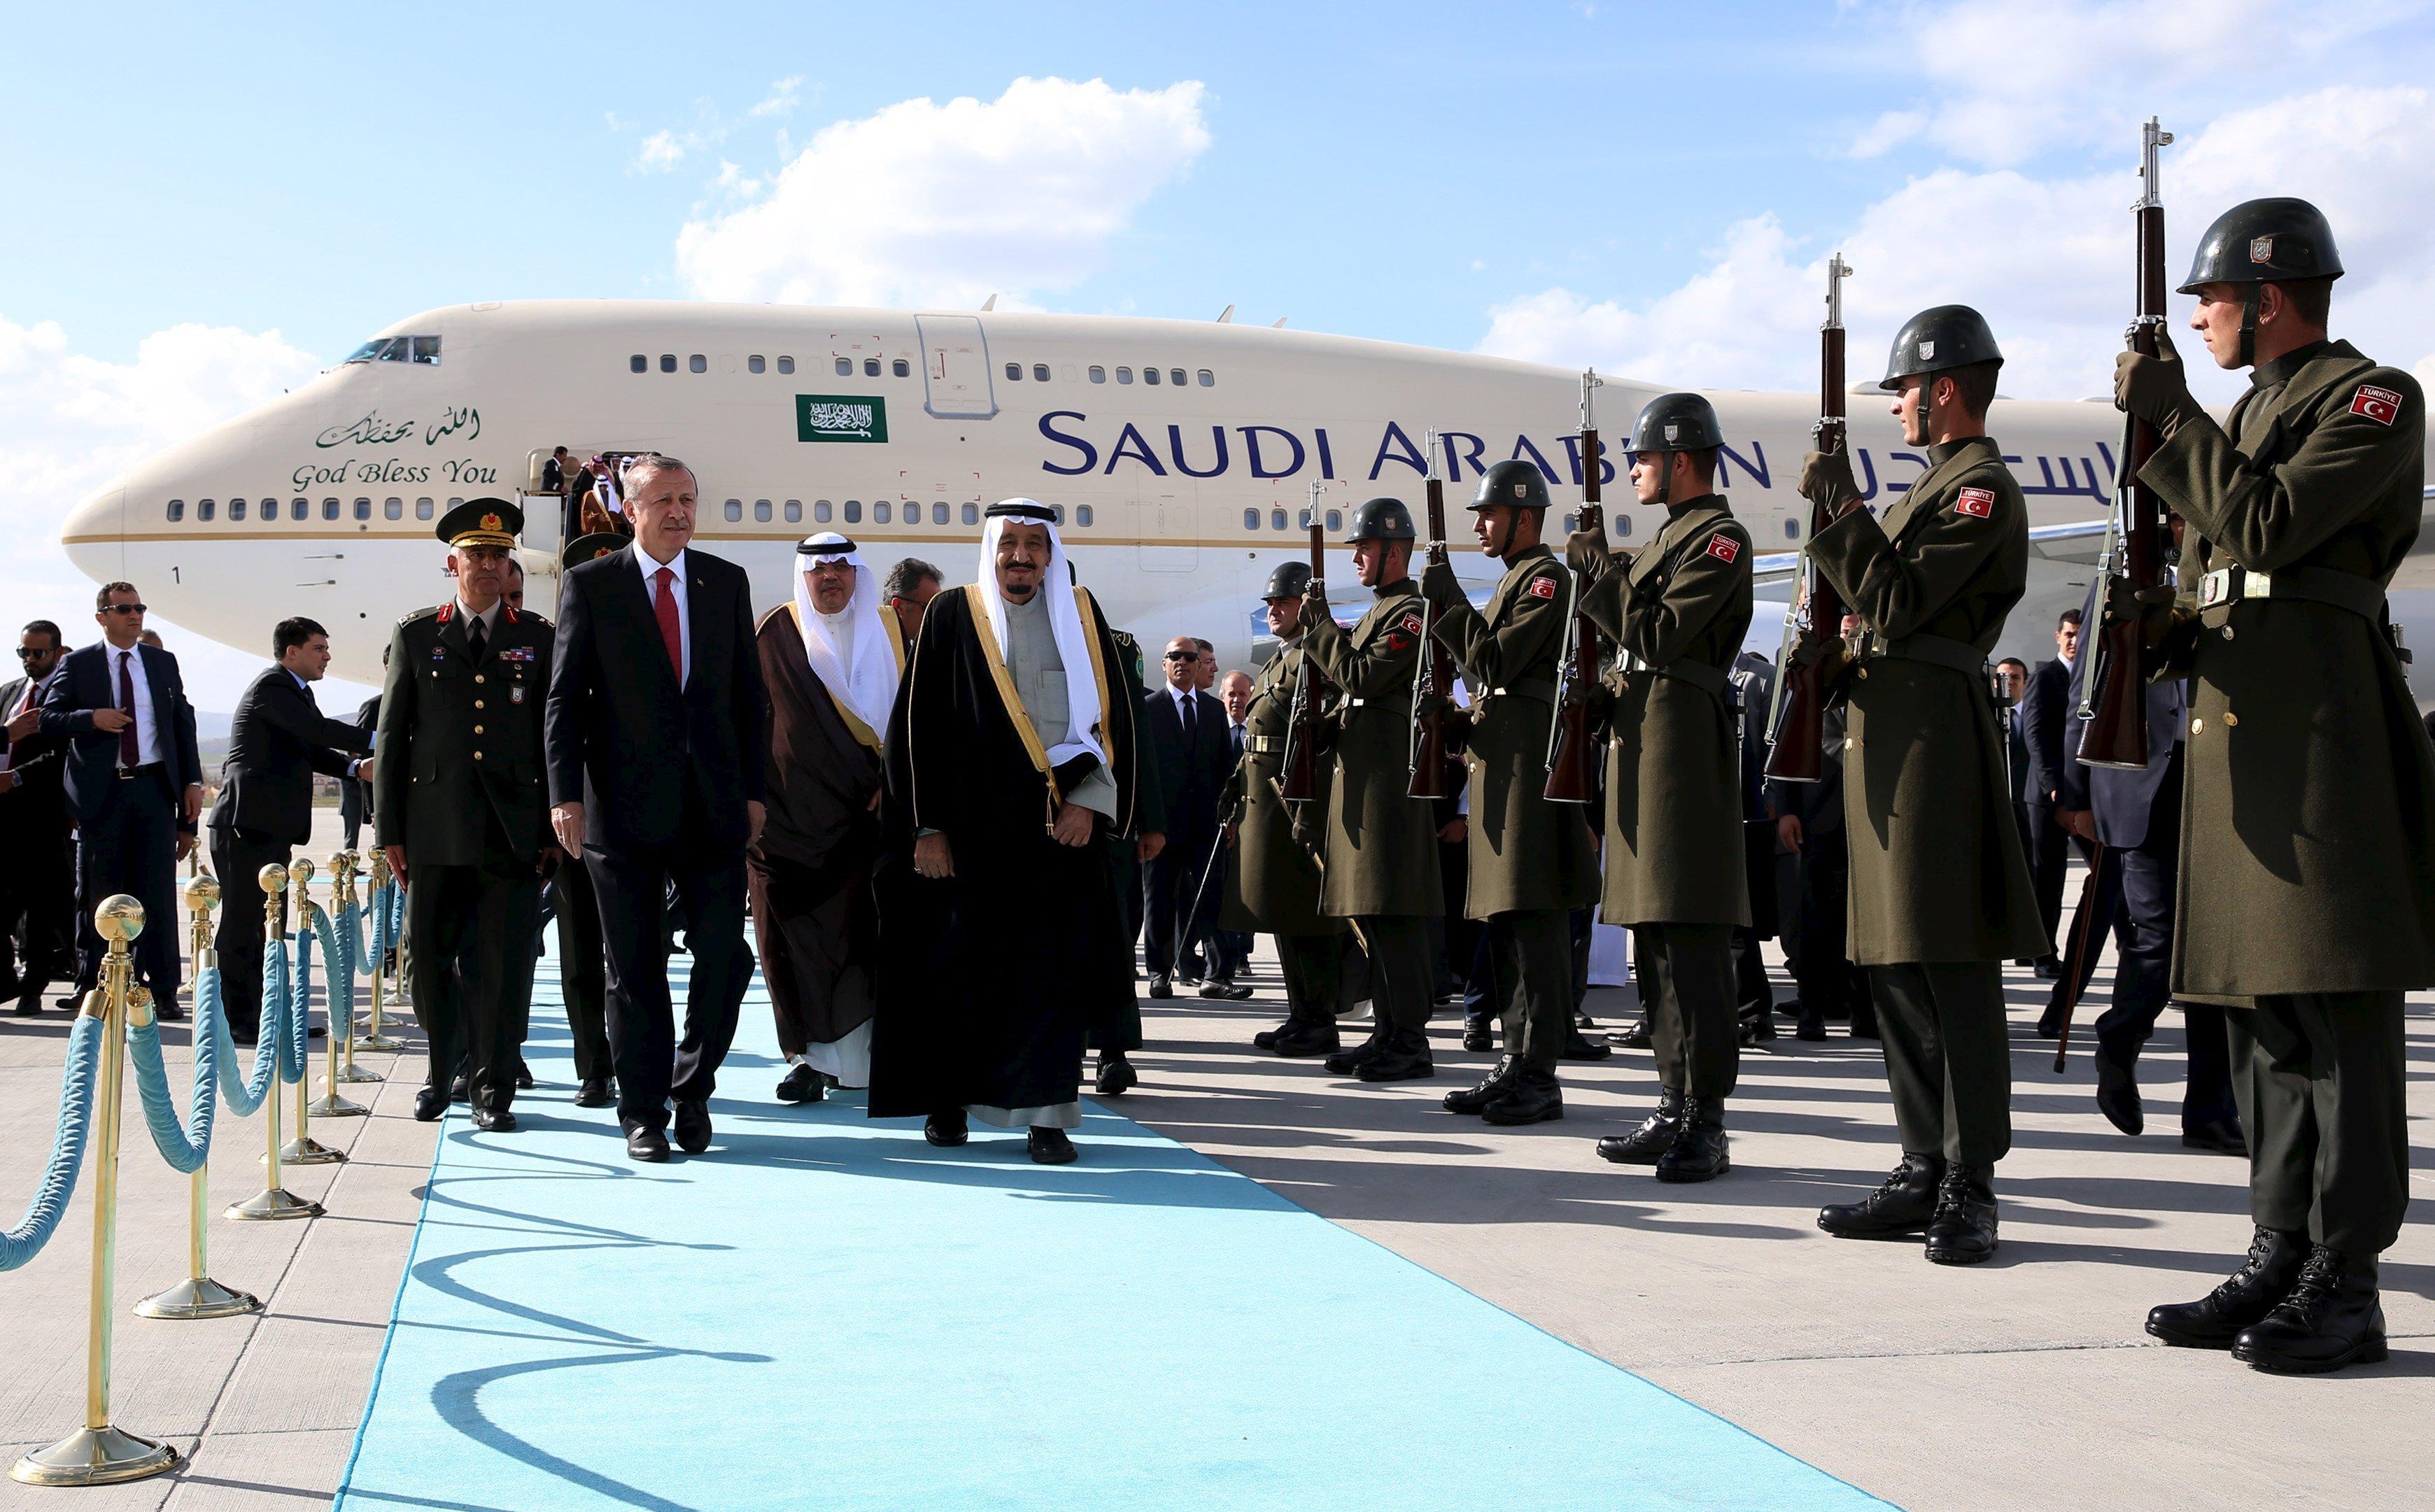 President Erdogan welcomes King Salman bin Abdulaziz at Esenboga International airport in Ankara, April 11, 2016.